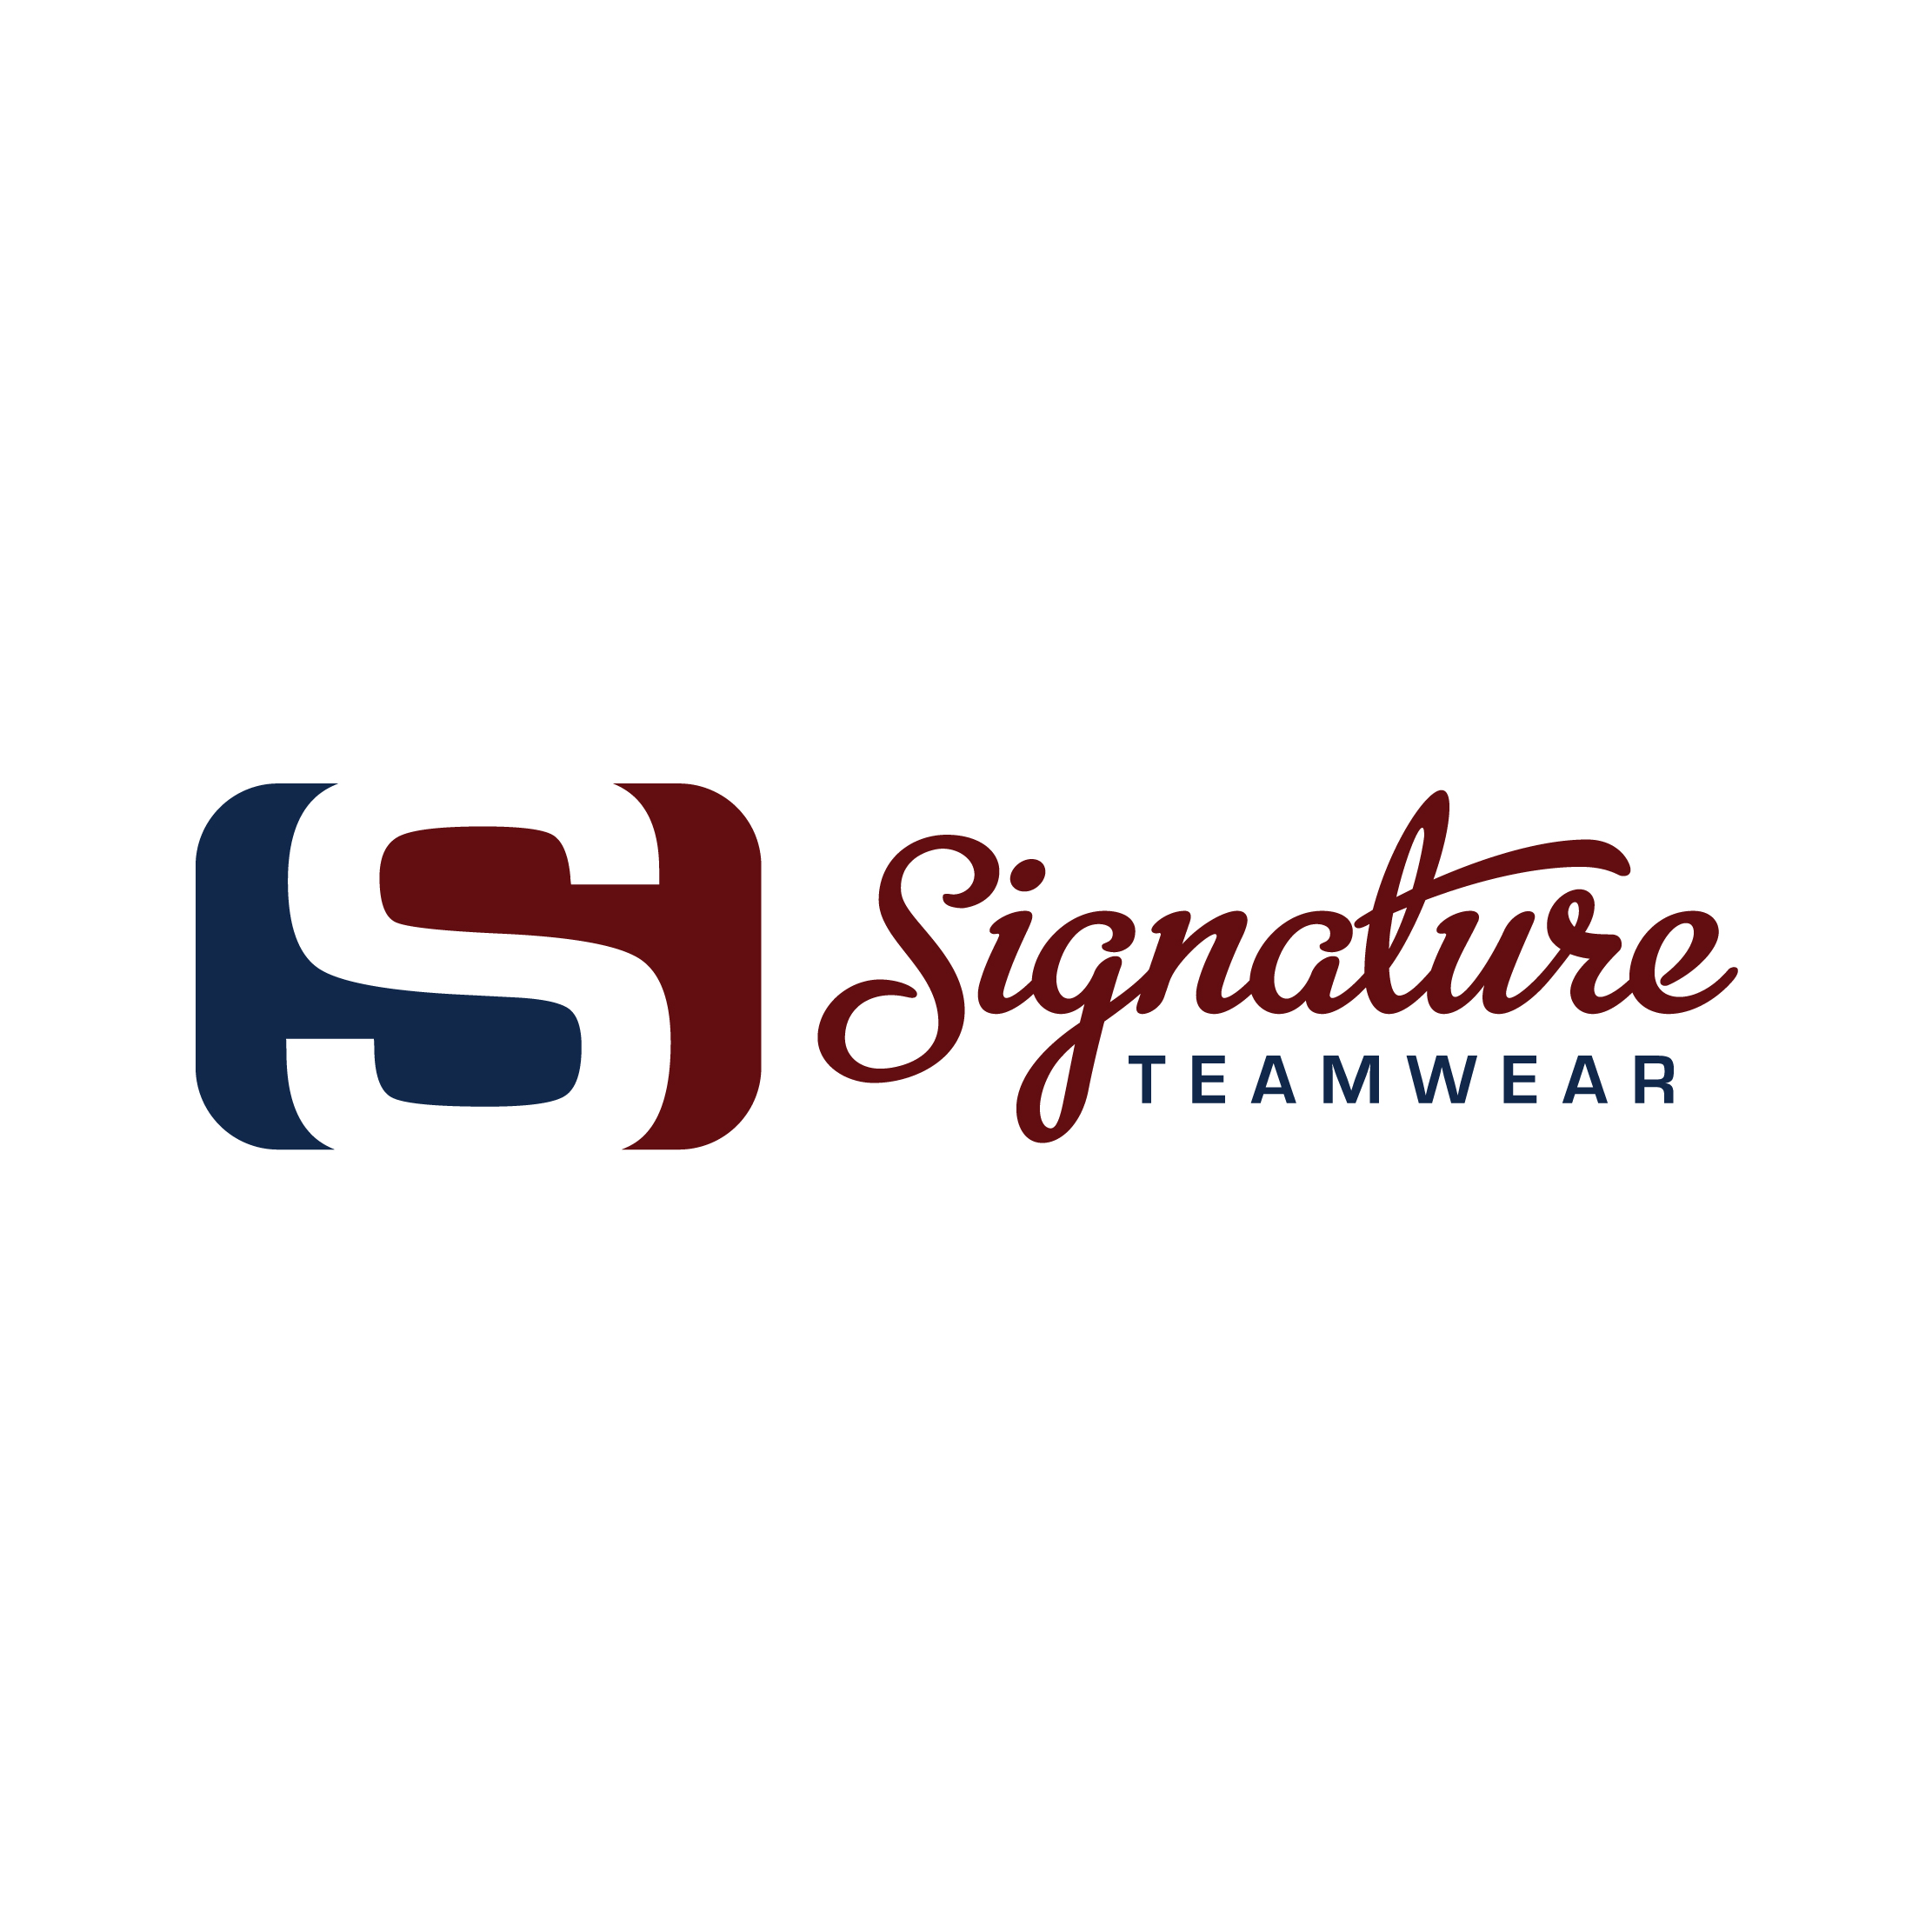 Signature Teamwear Logo